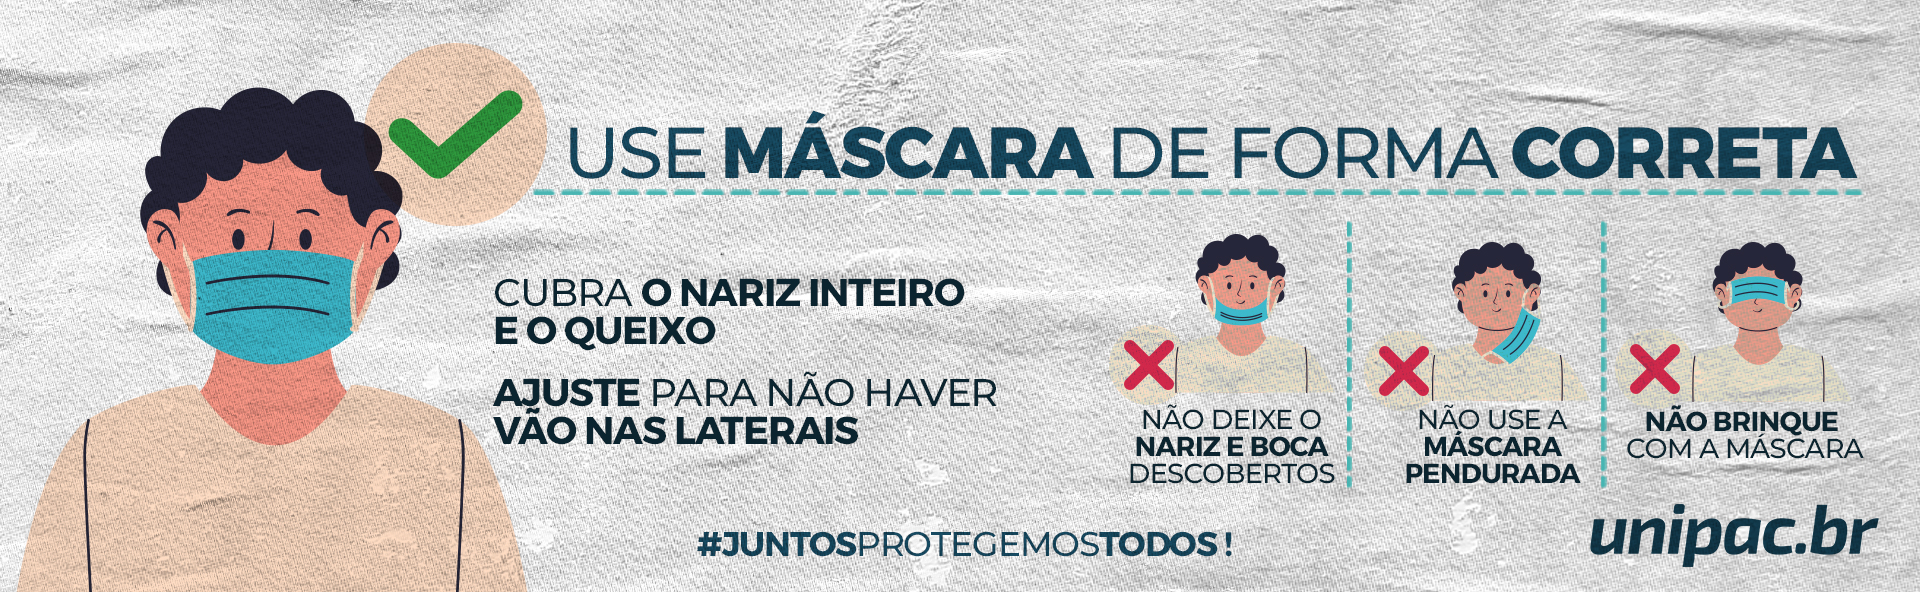 Máscara – desktop – 02/10/2020